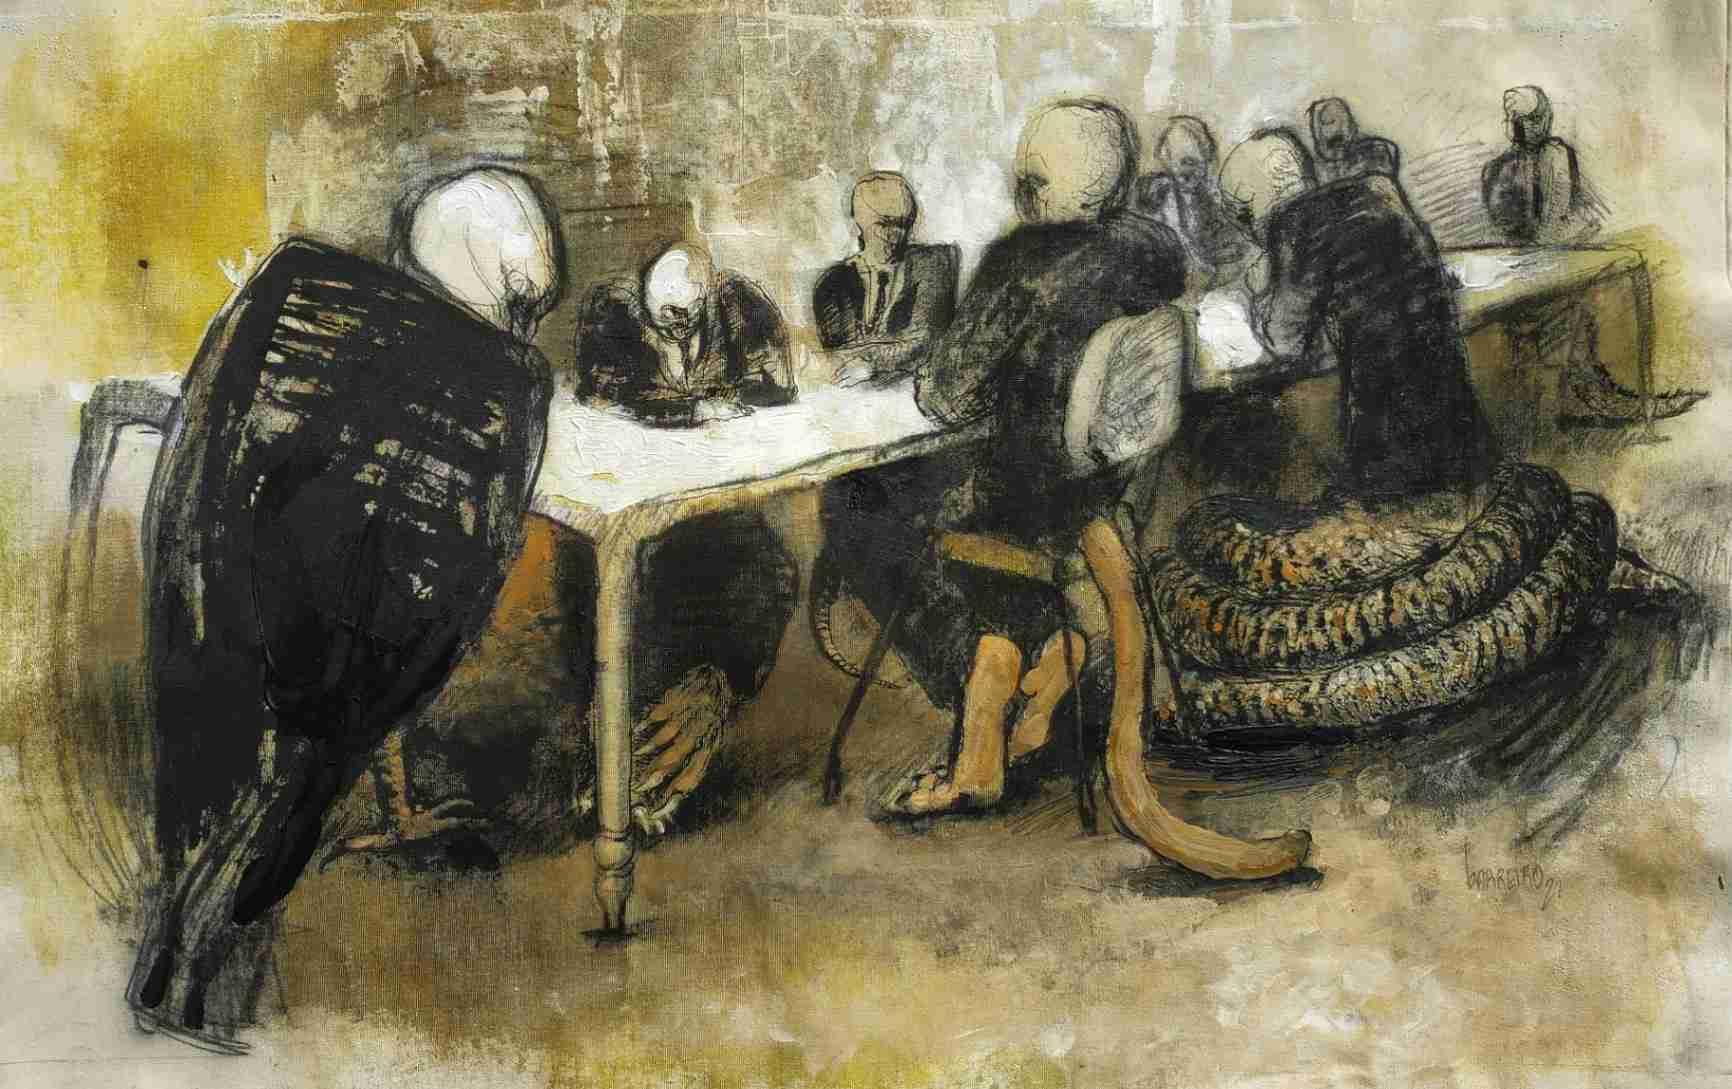 Obra: El banquete